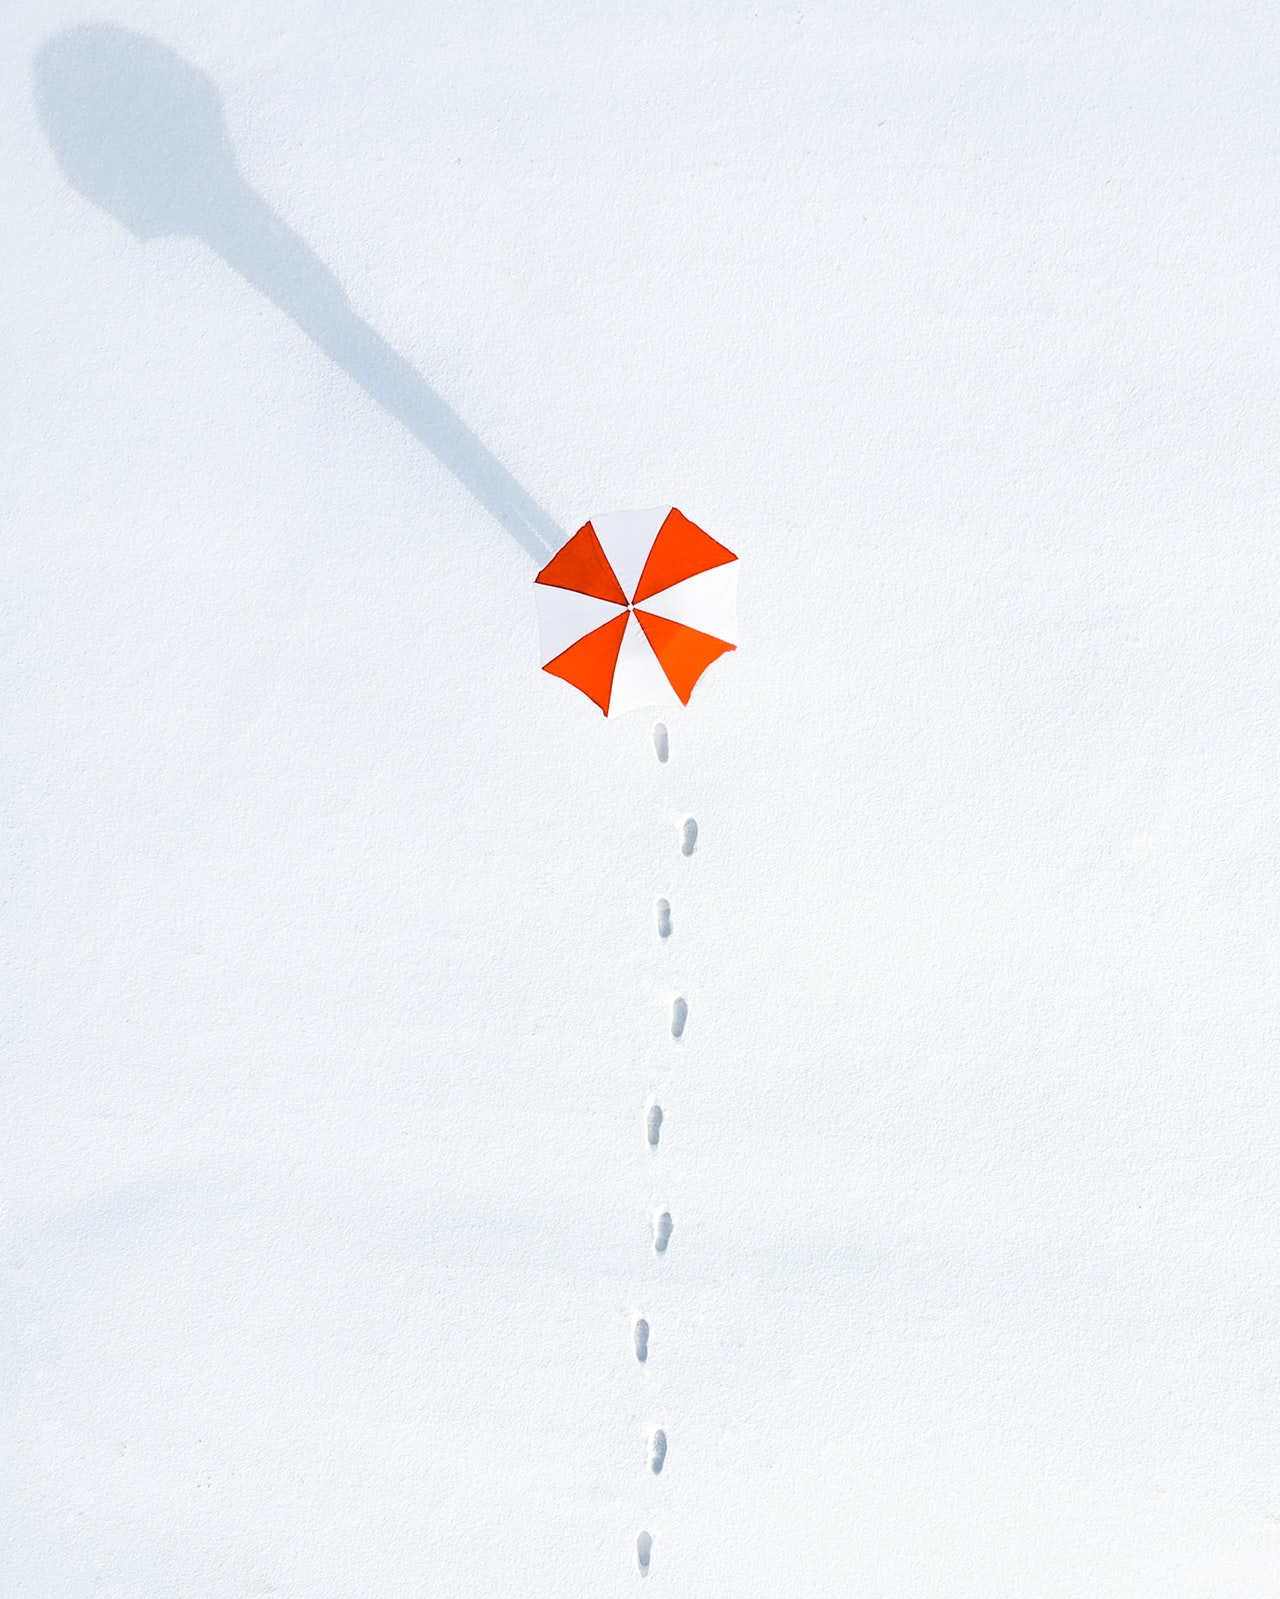 aerial-shot-aerial-view-bird-s-eye-view-2404673.jpg